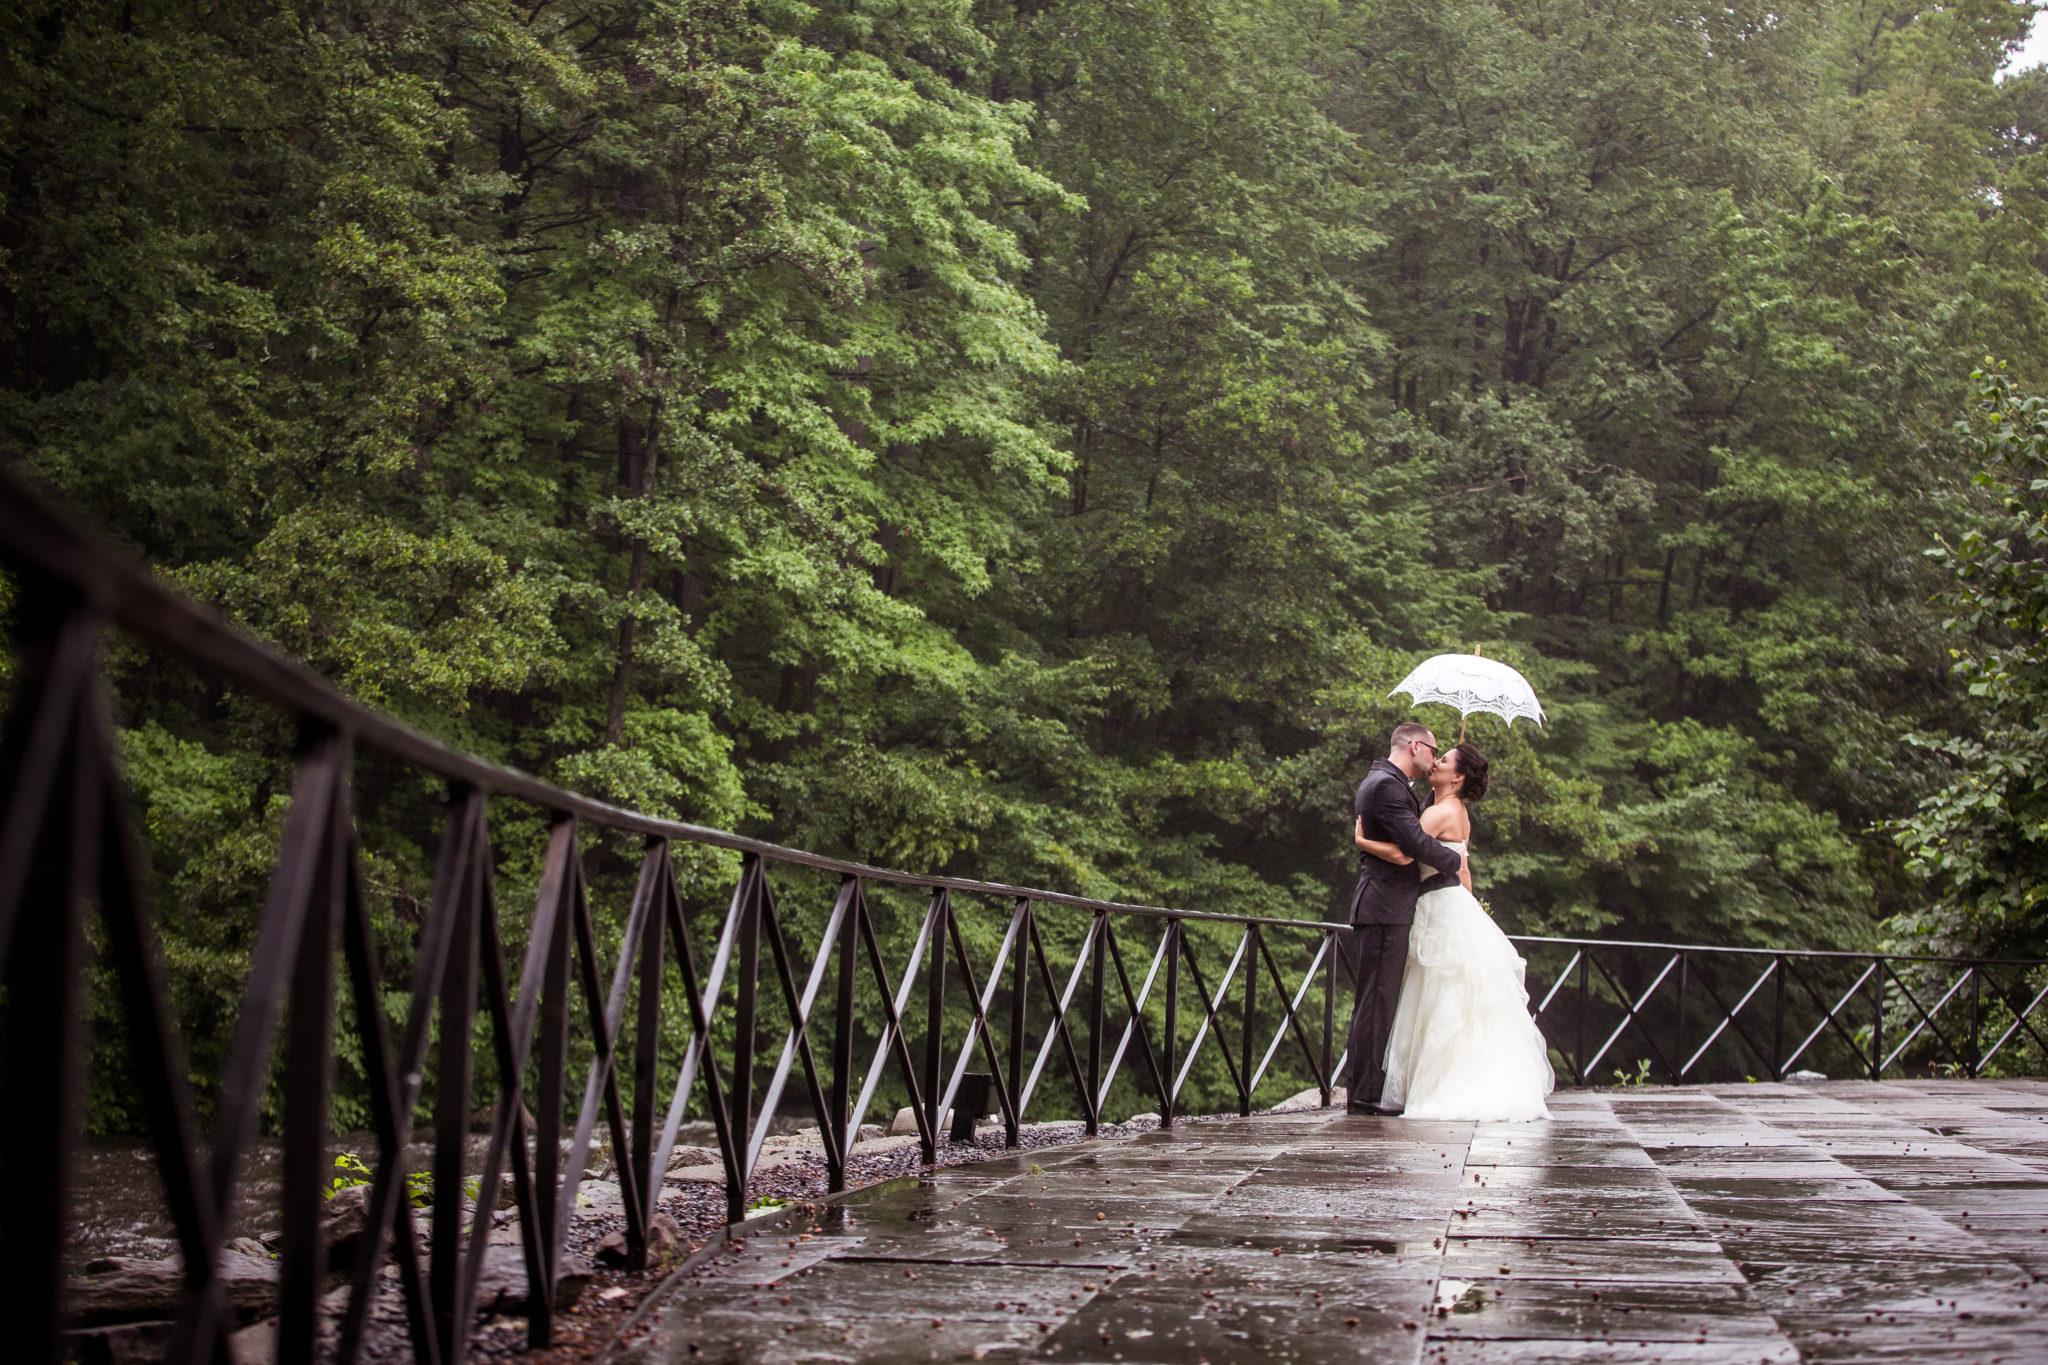 Marijela + Steven | New York Botanical Gardens wedding at Stone Mill